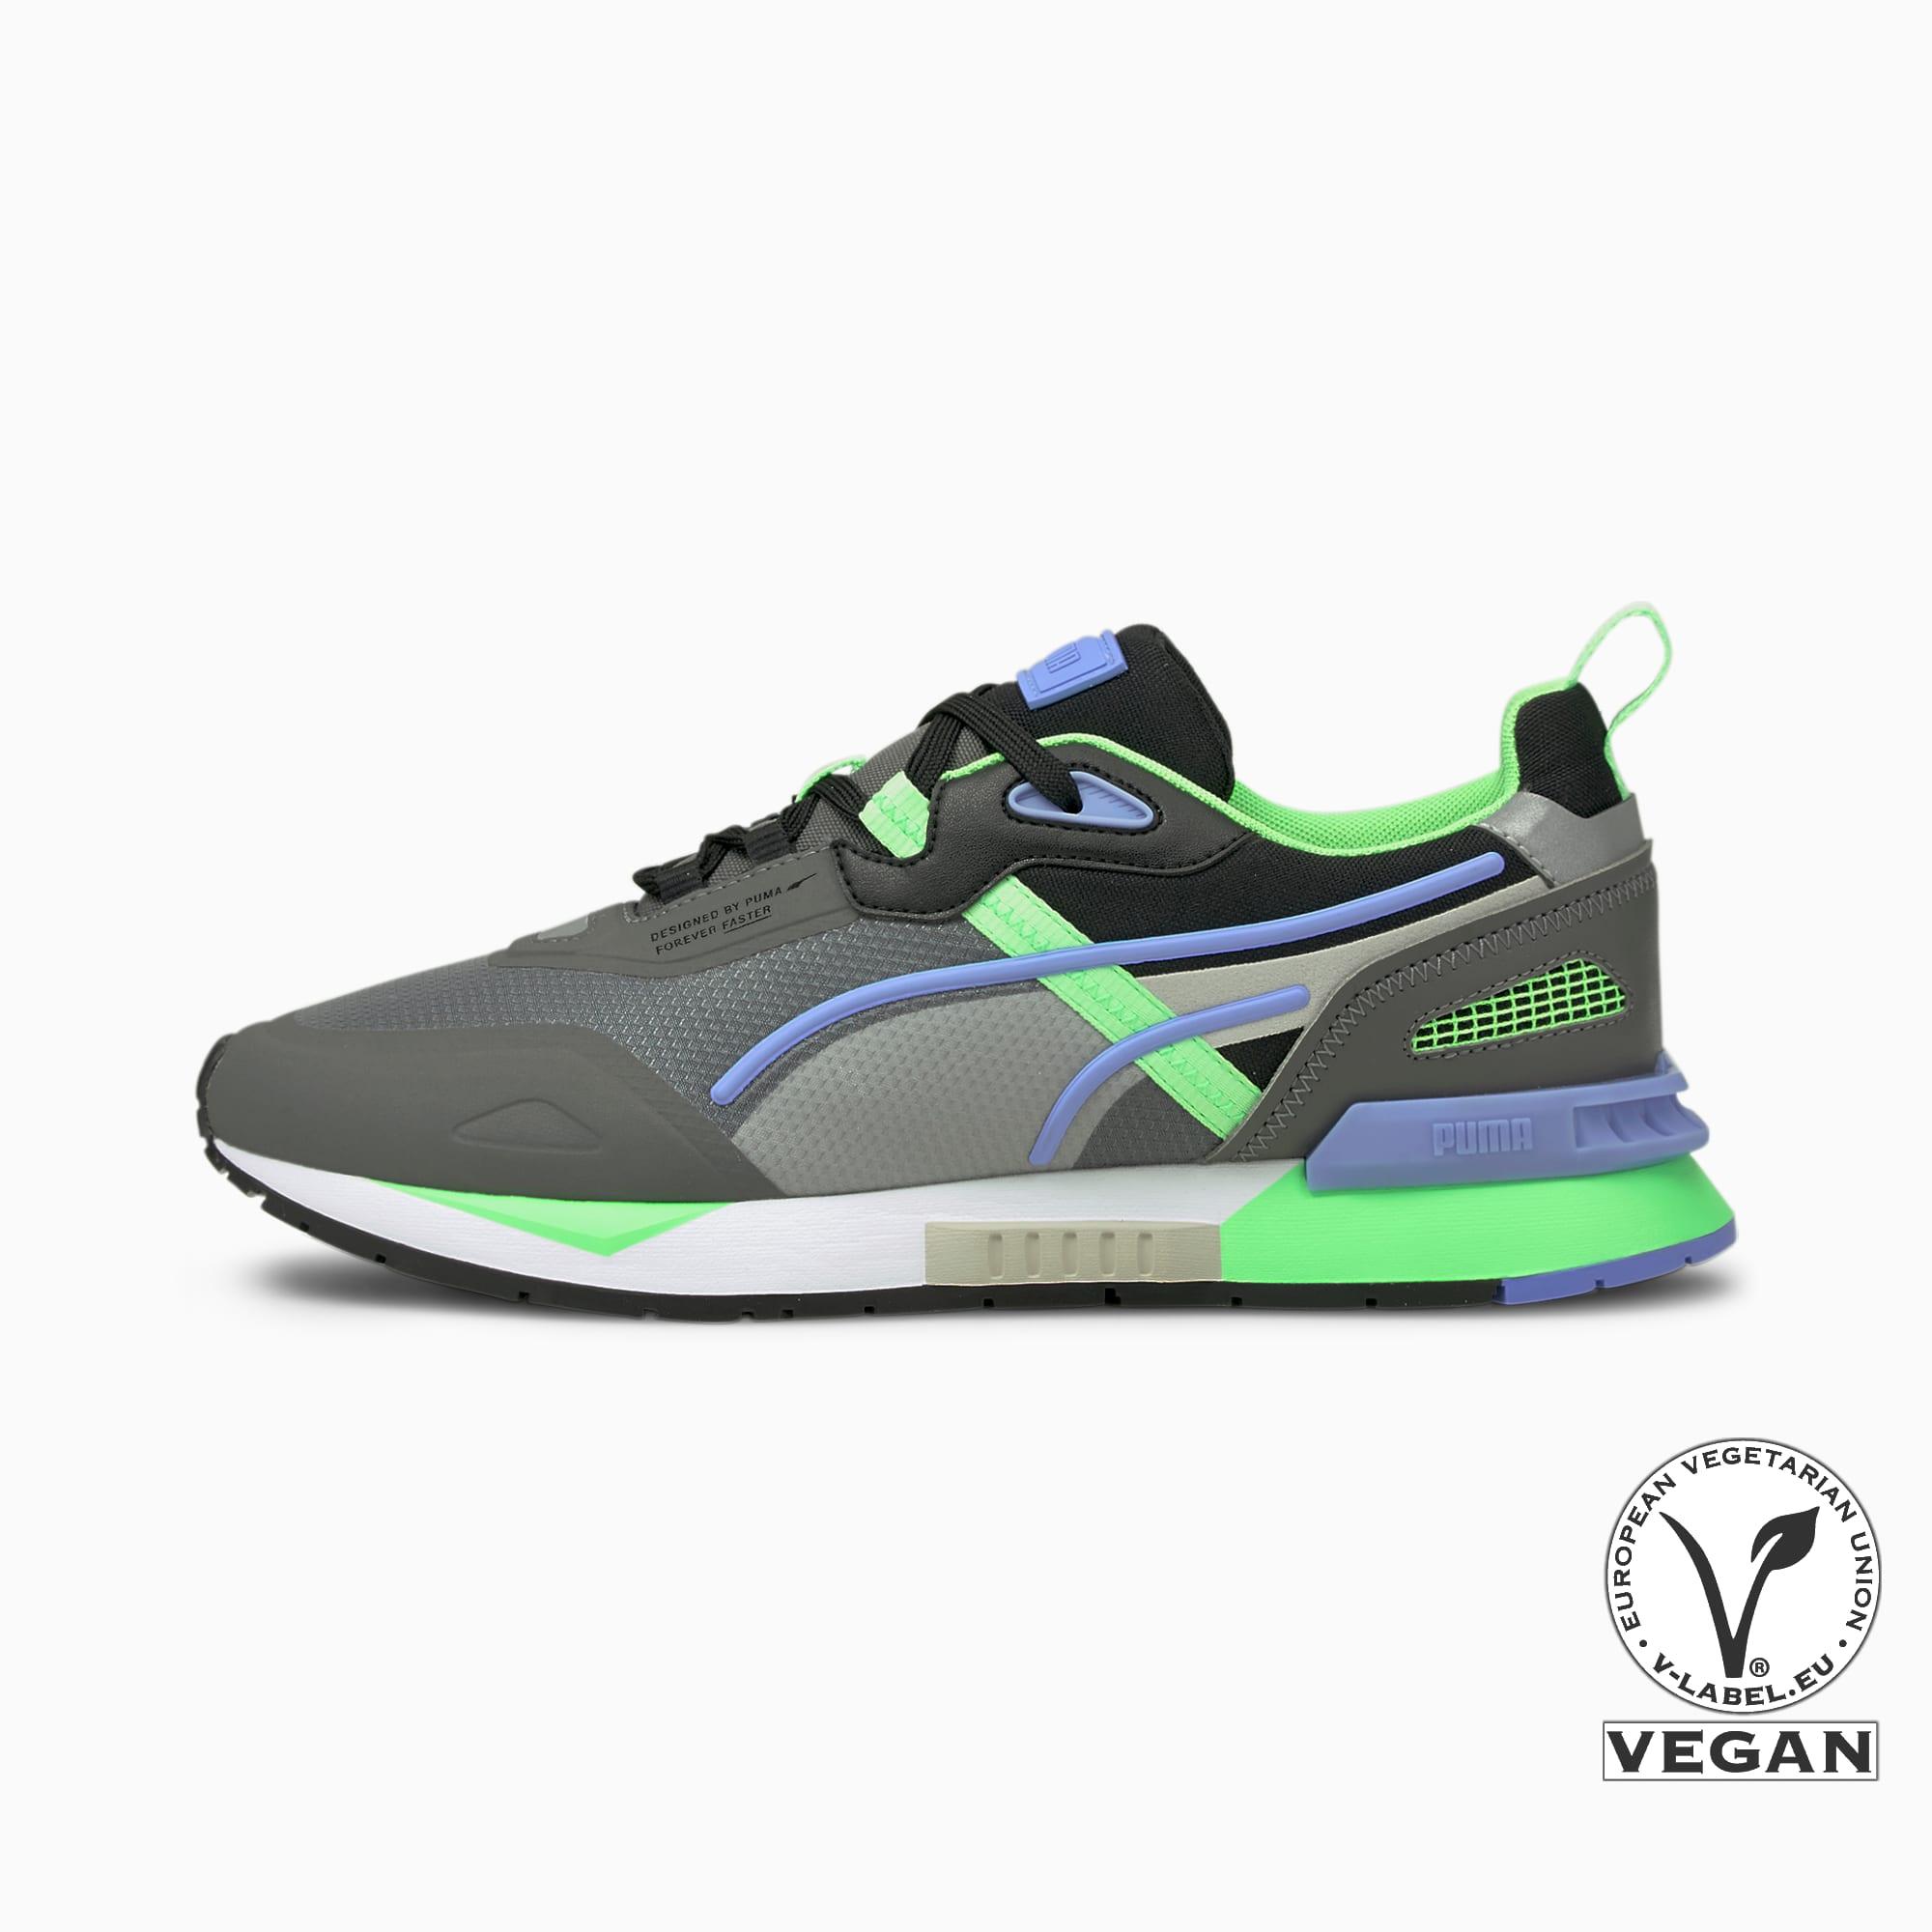 Mirage Tech Sneakers